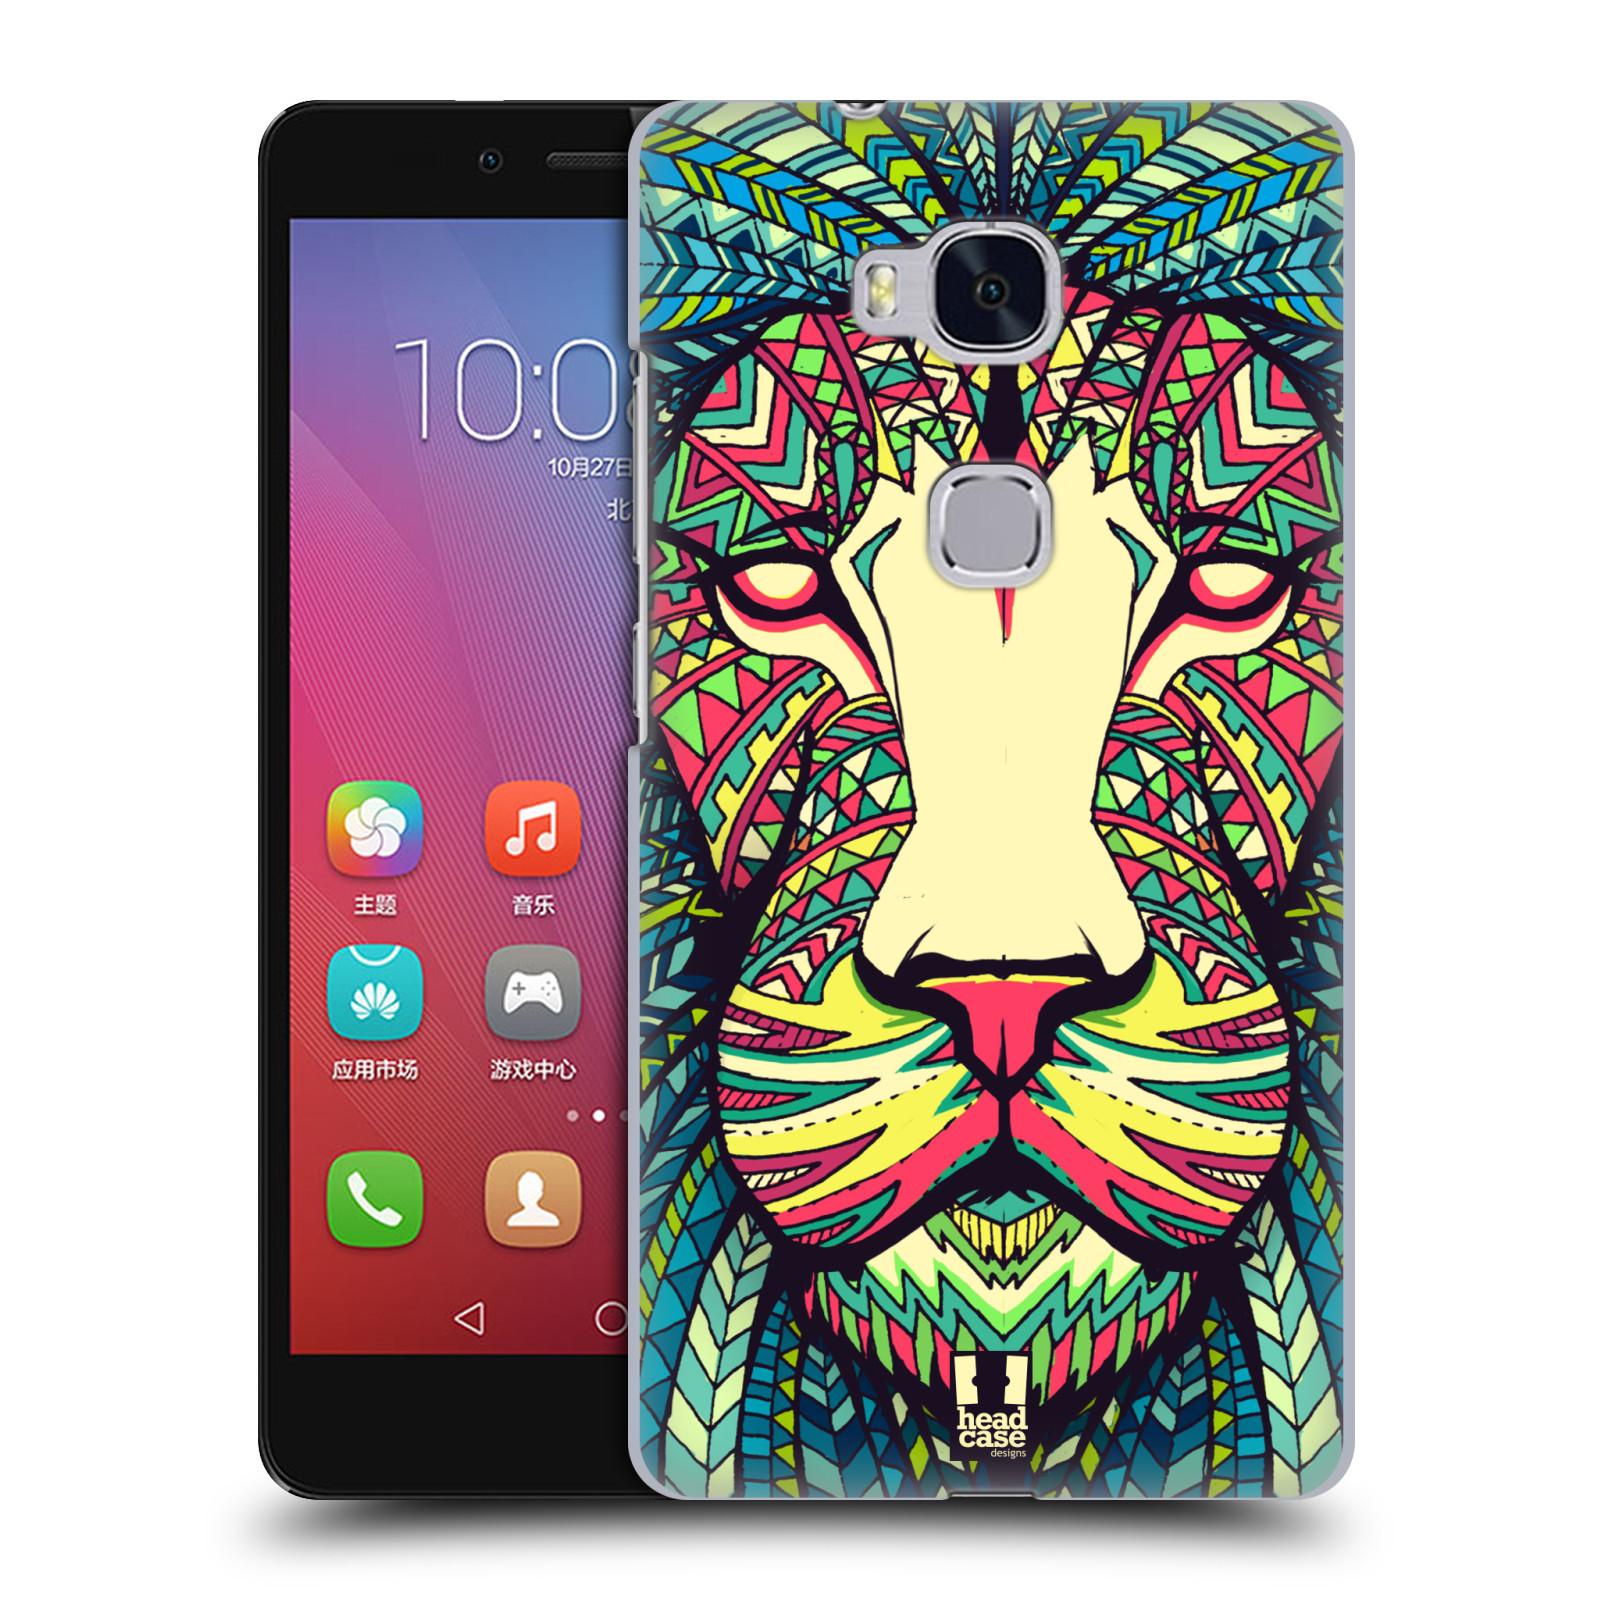 HEAD CASE pevný plastový obal na mobil HUAWEI HONOR 5X vzor Aztécký motiv zvíře lev